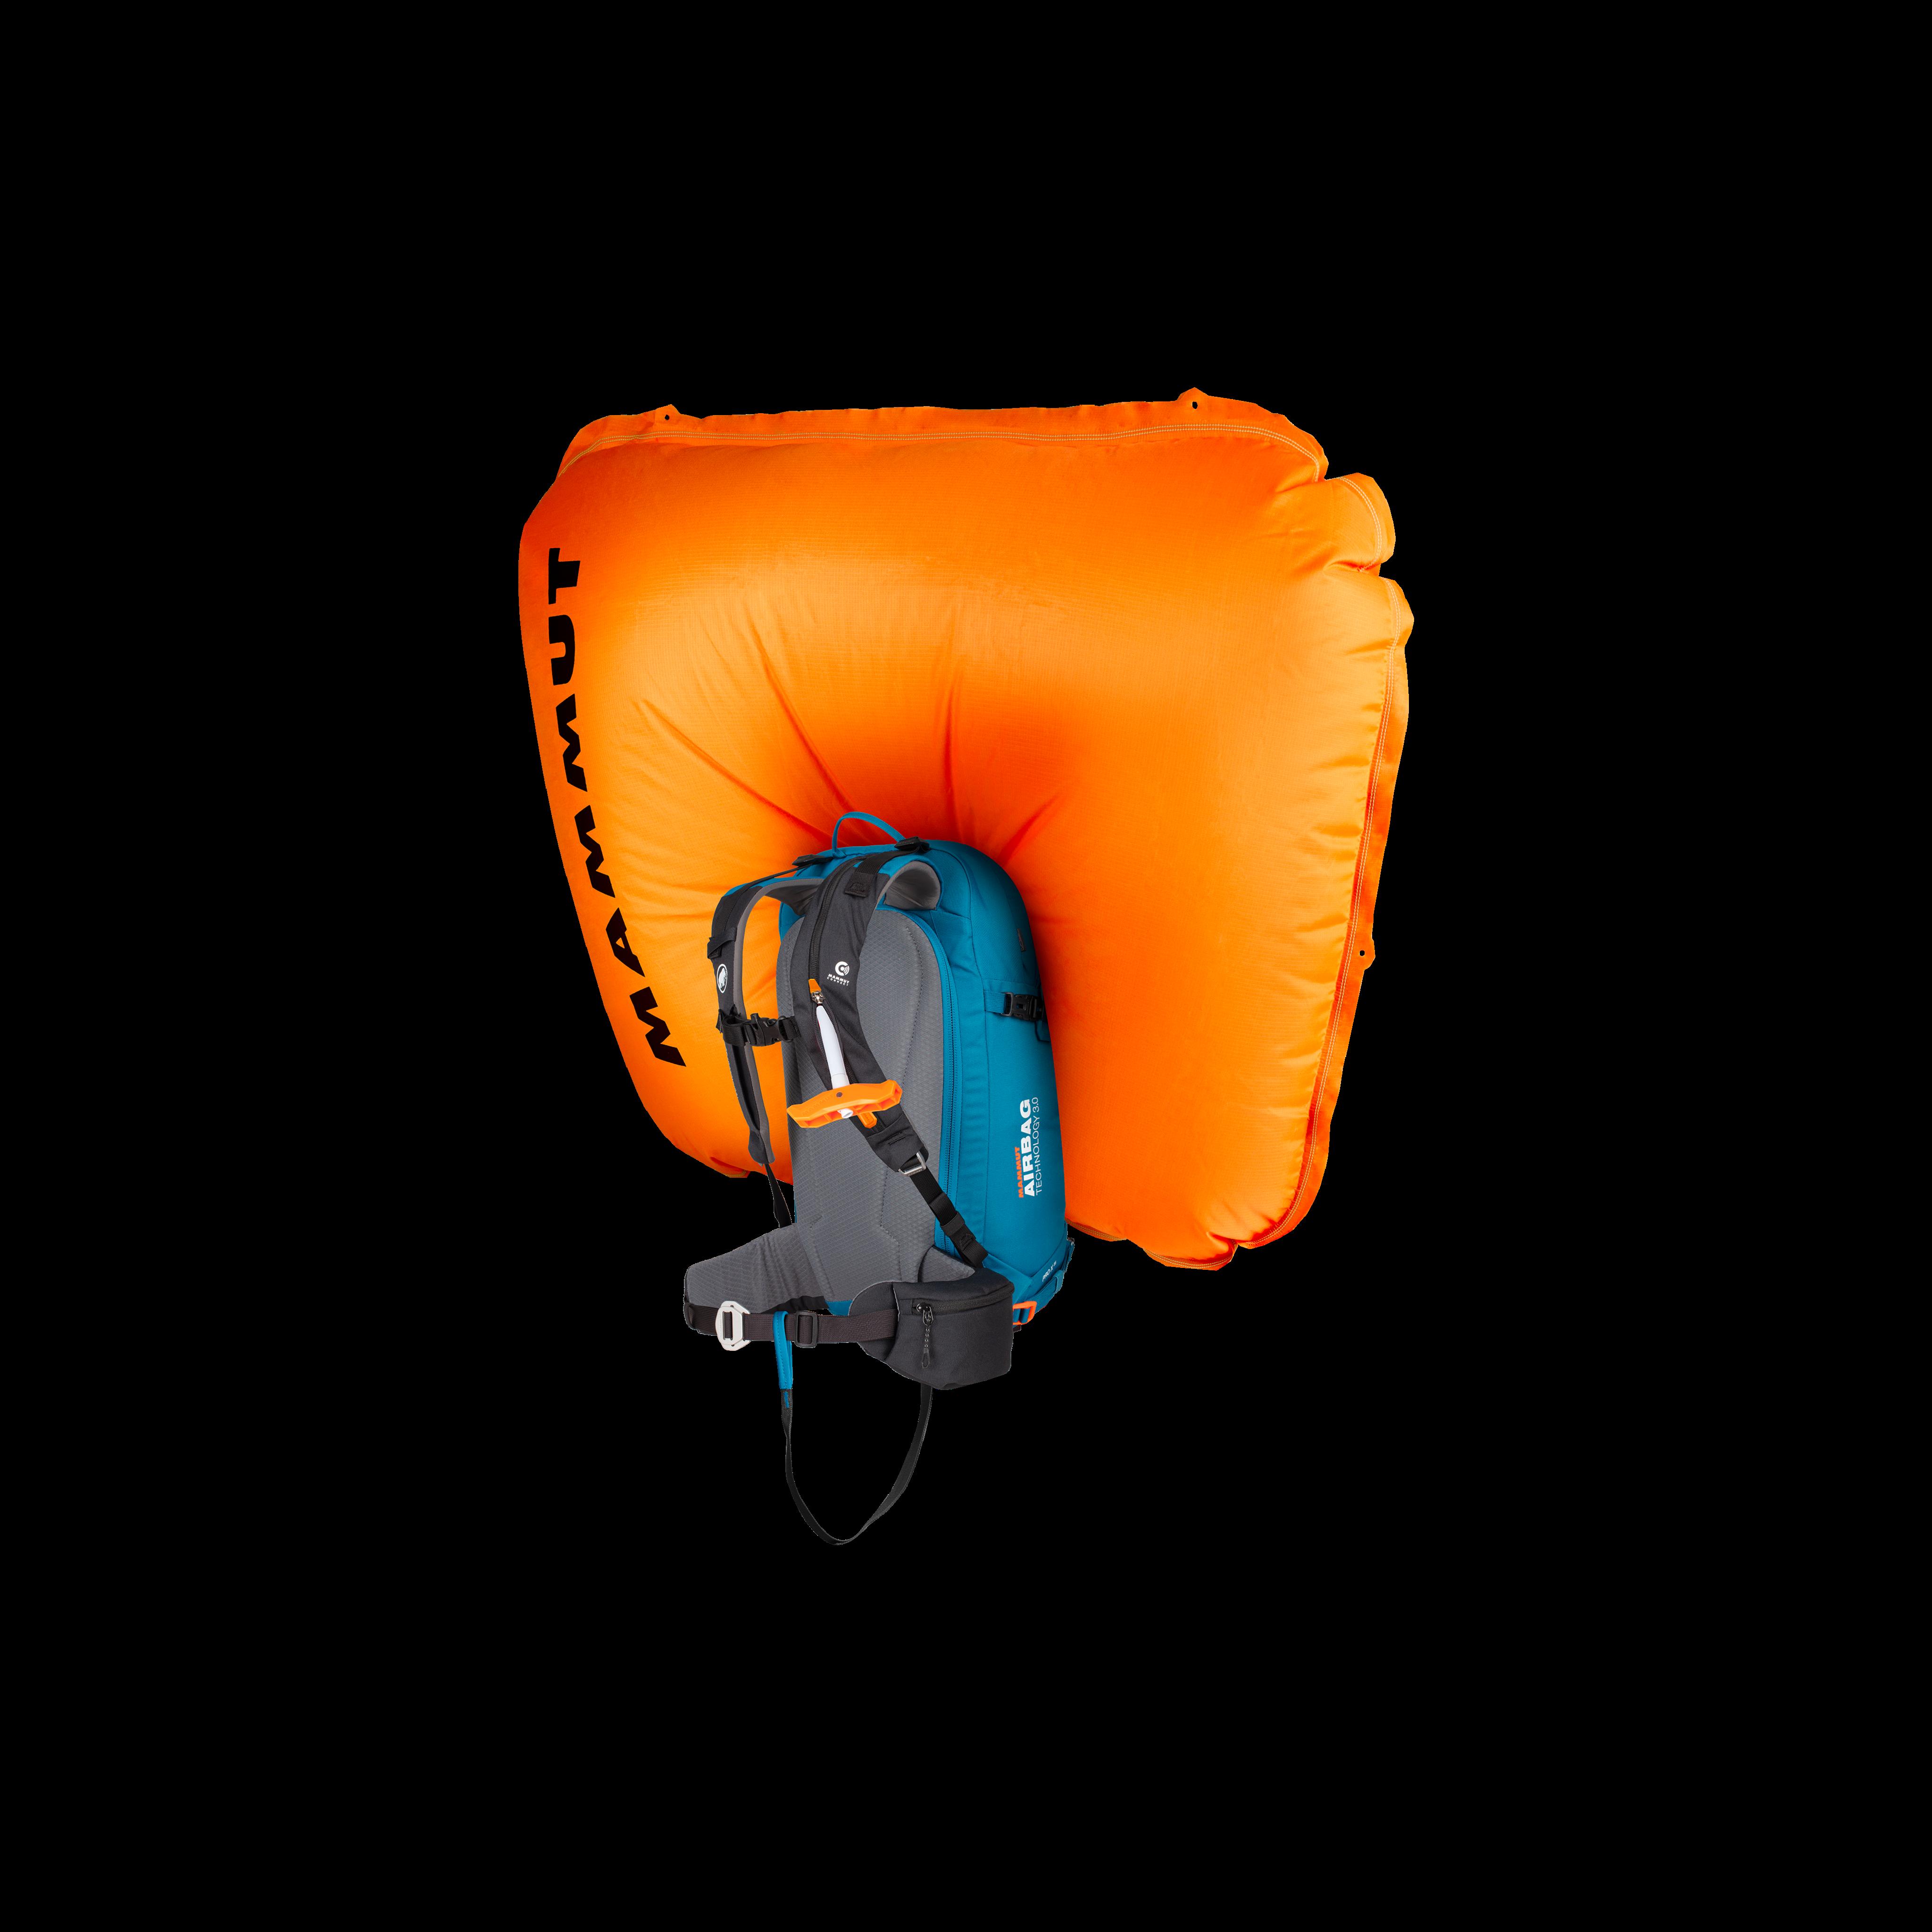 Pro X Removable Airbag 3.0 - 35 L, sapphire-black thumbnail